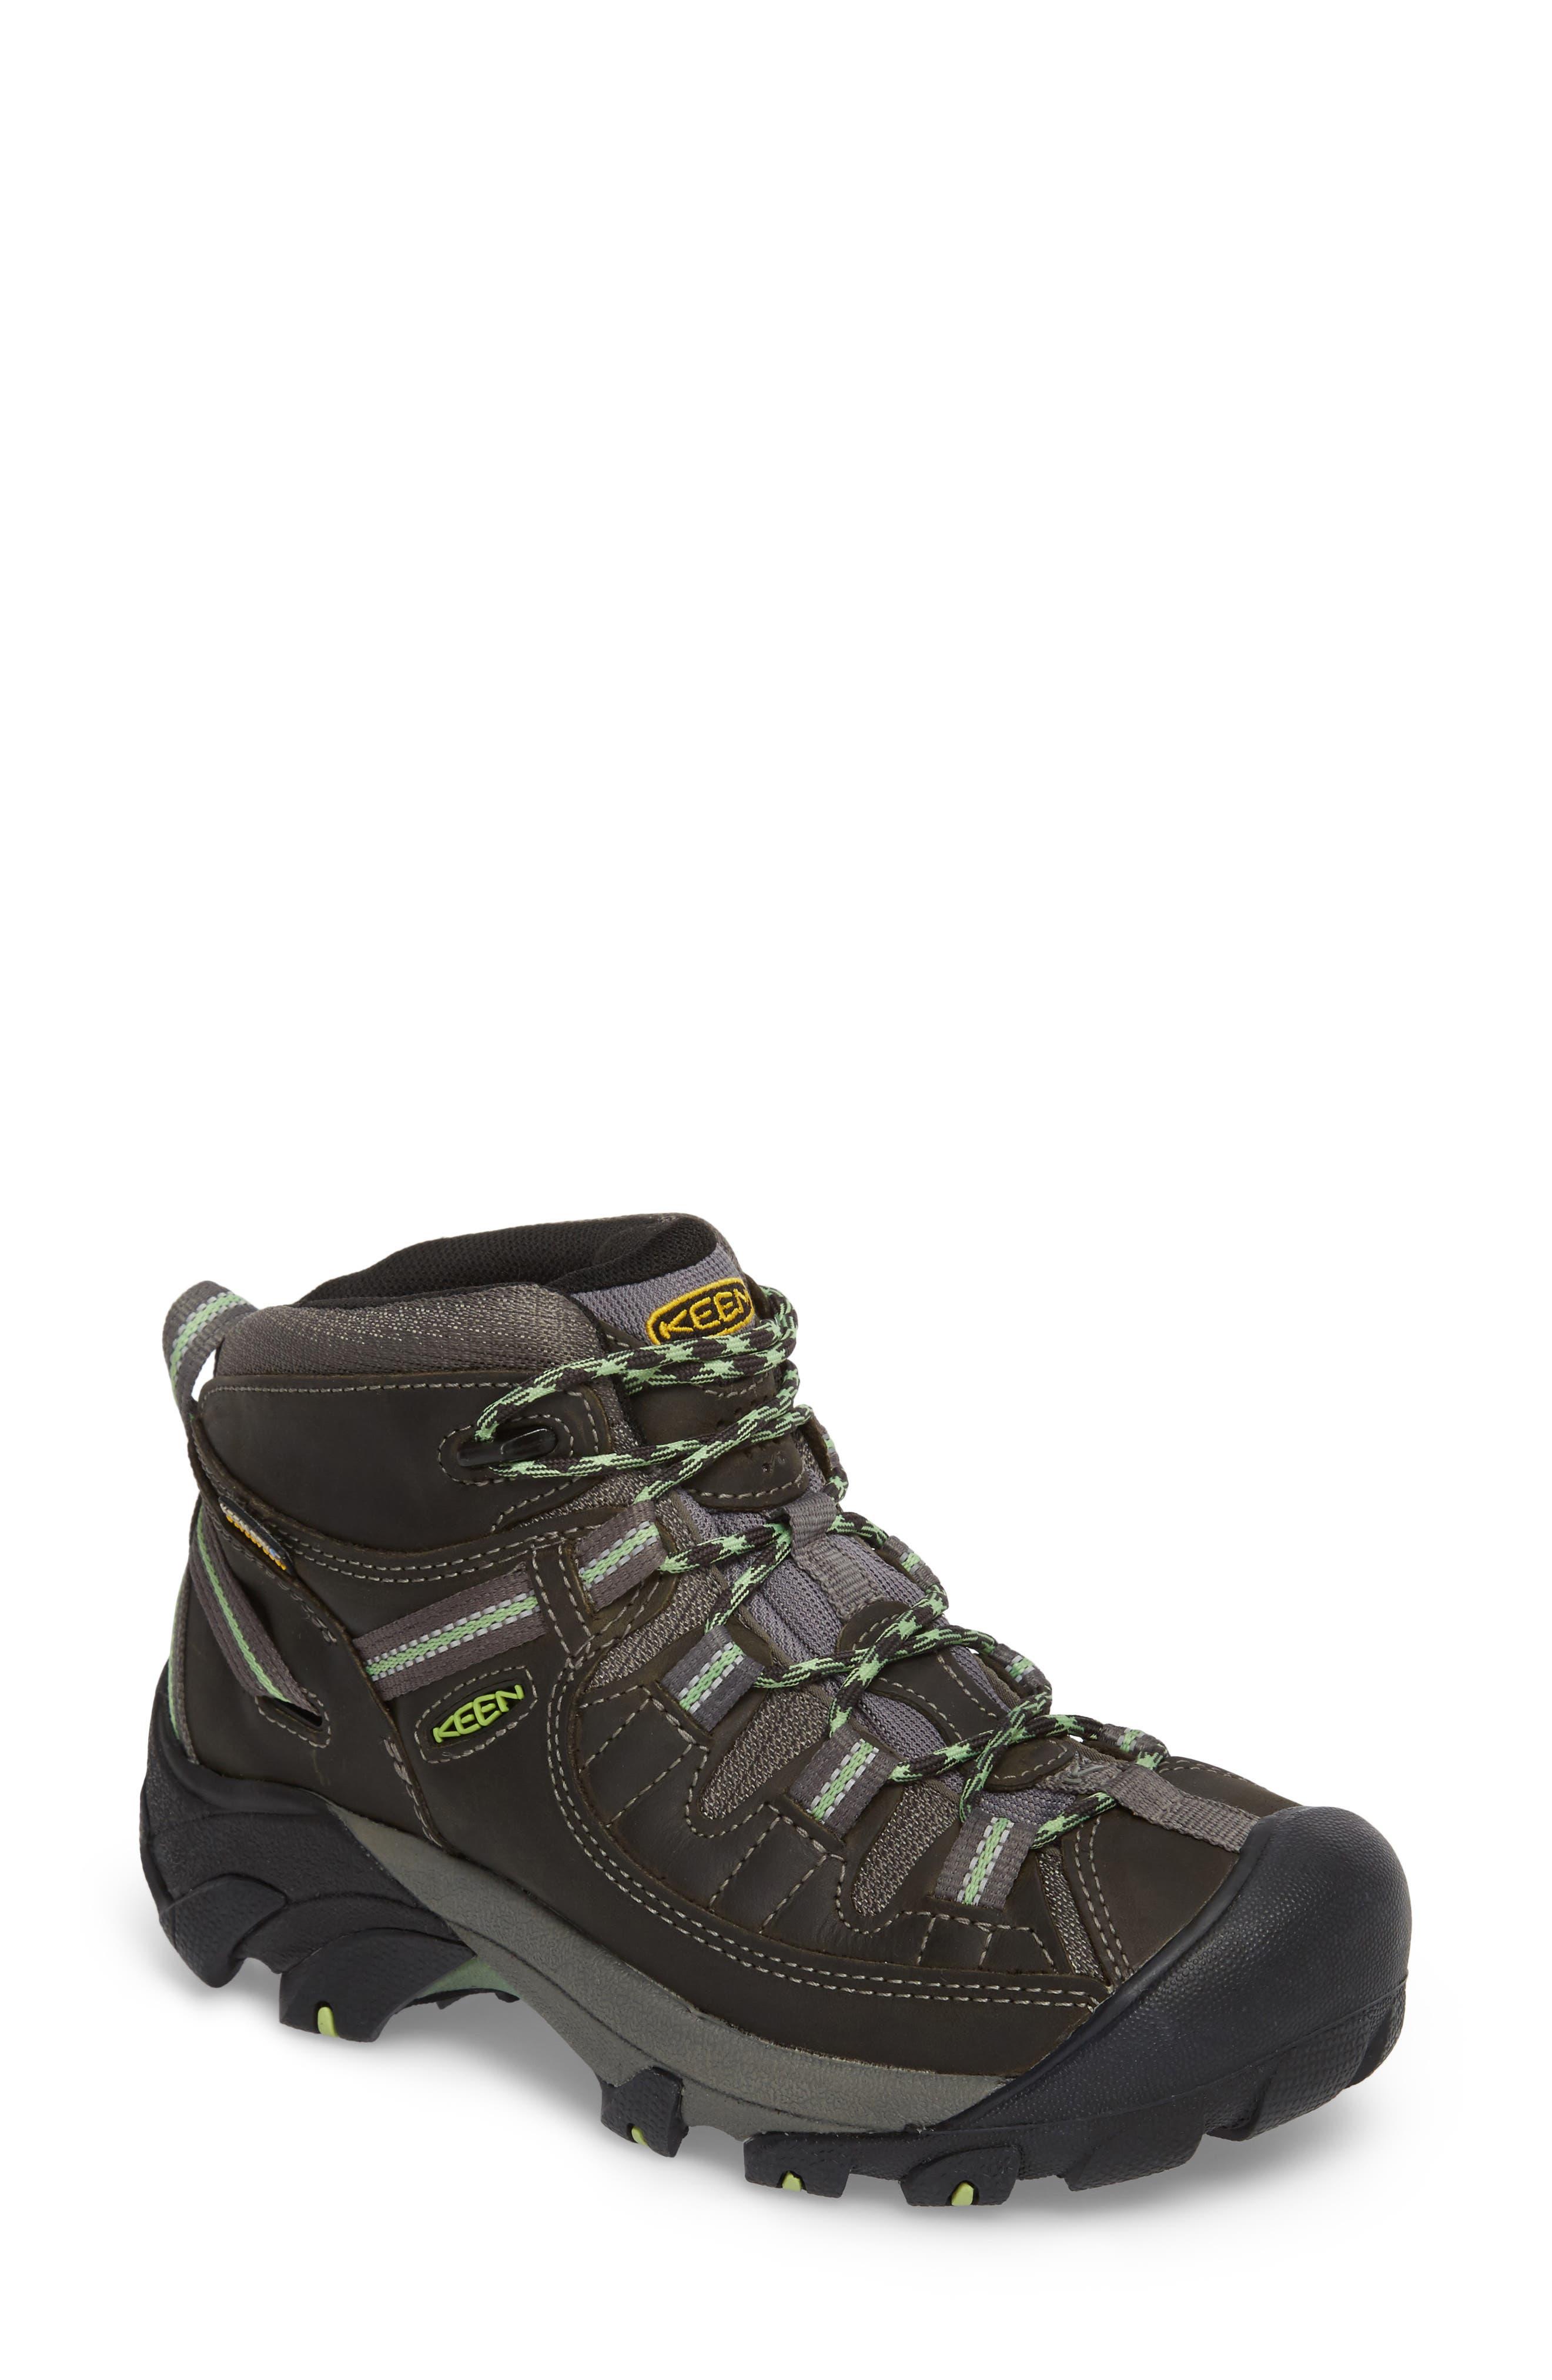 Targhee II Mid Waterproof Hiking Boot,                             Main thumbnail 1, color,                             RAVEN/ OPALINE